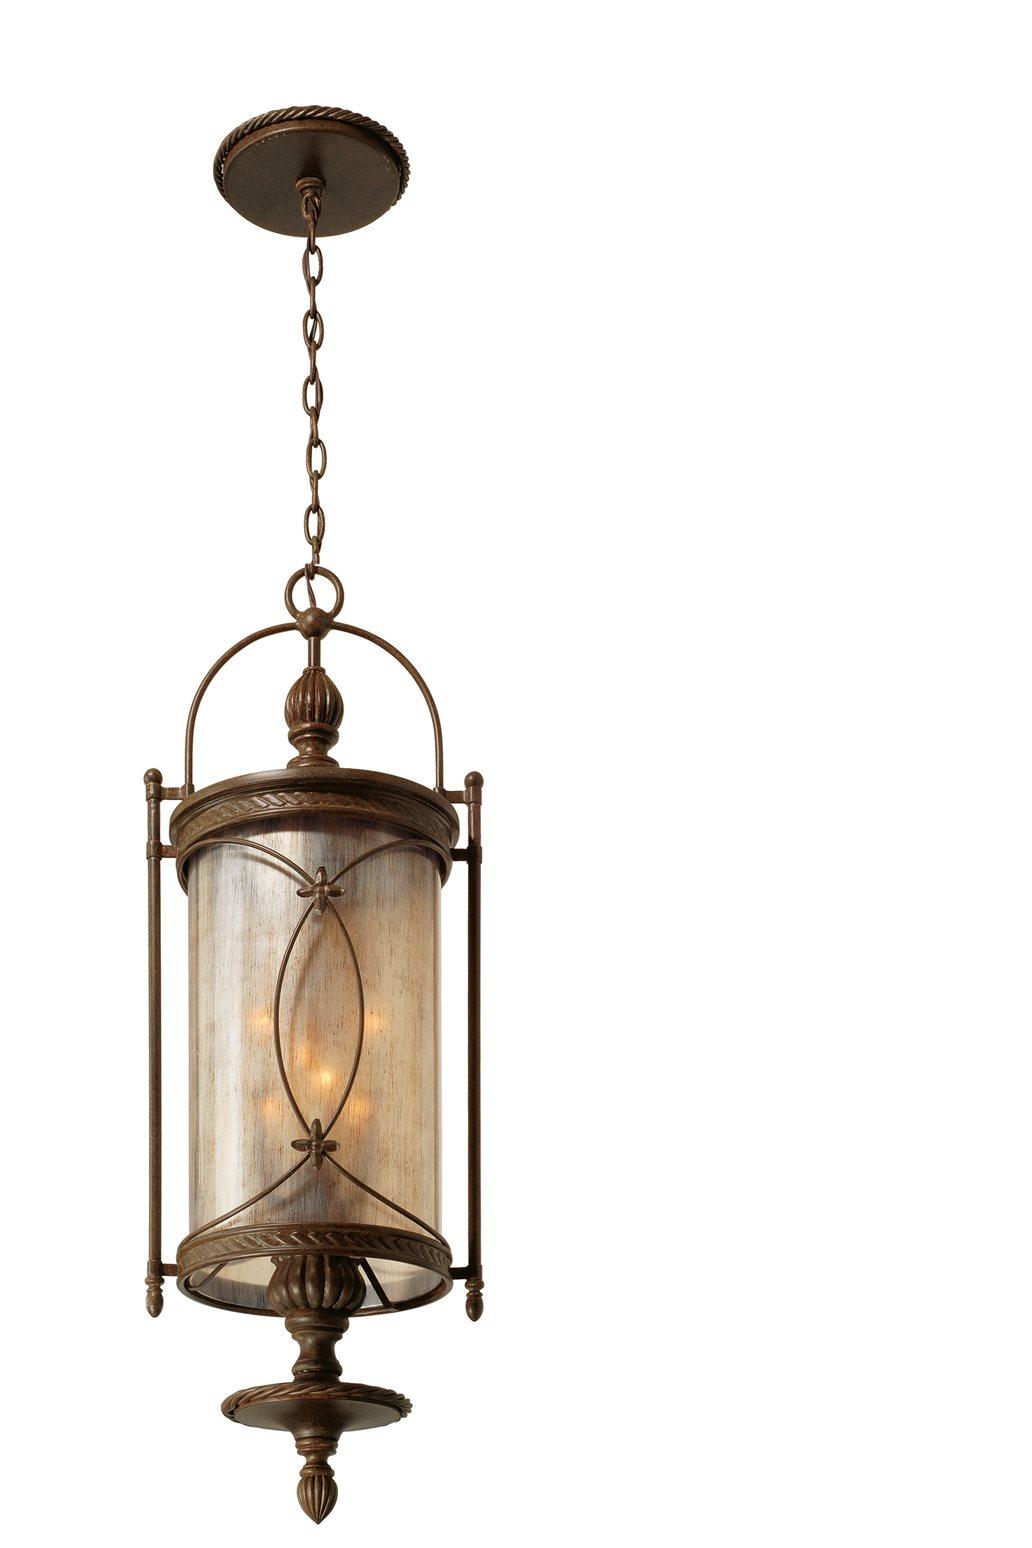 Traditional Outdoor Pendant Lighting : Corbett lighting st moritz traditional outdoor